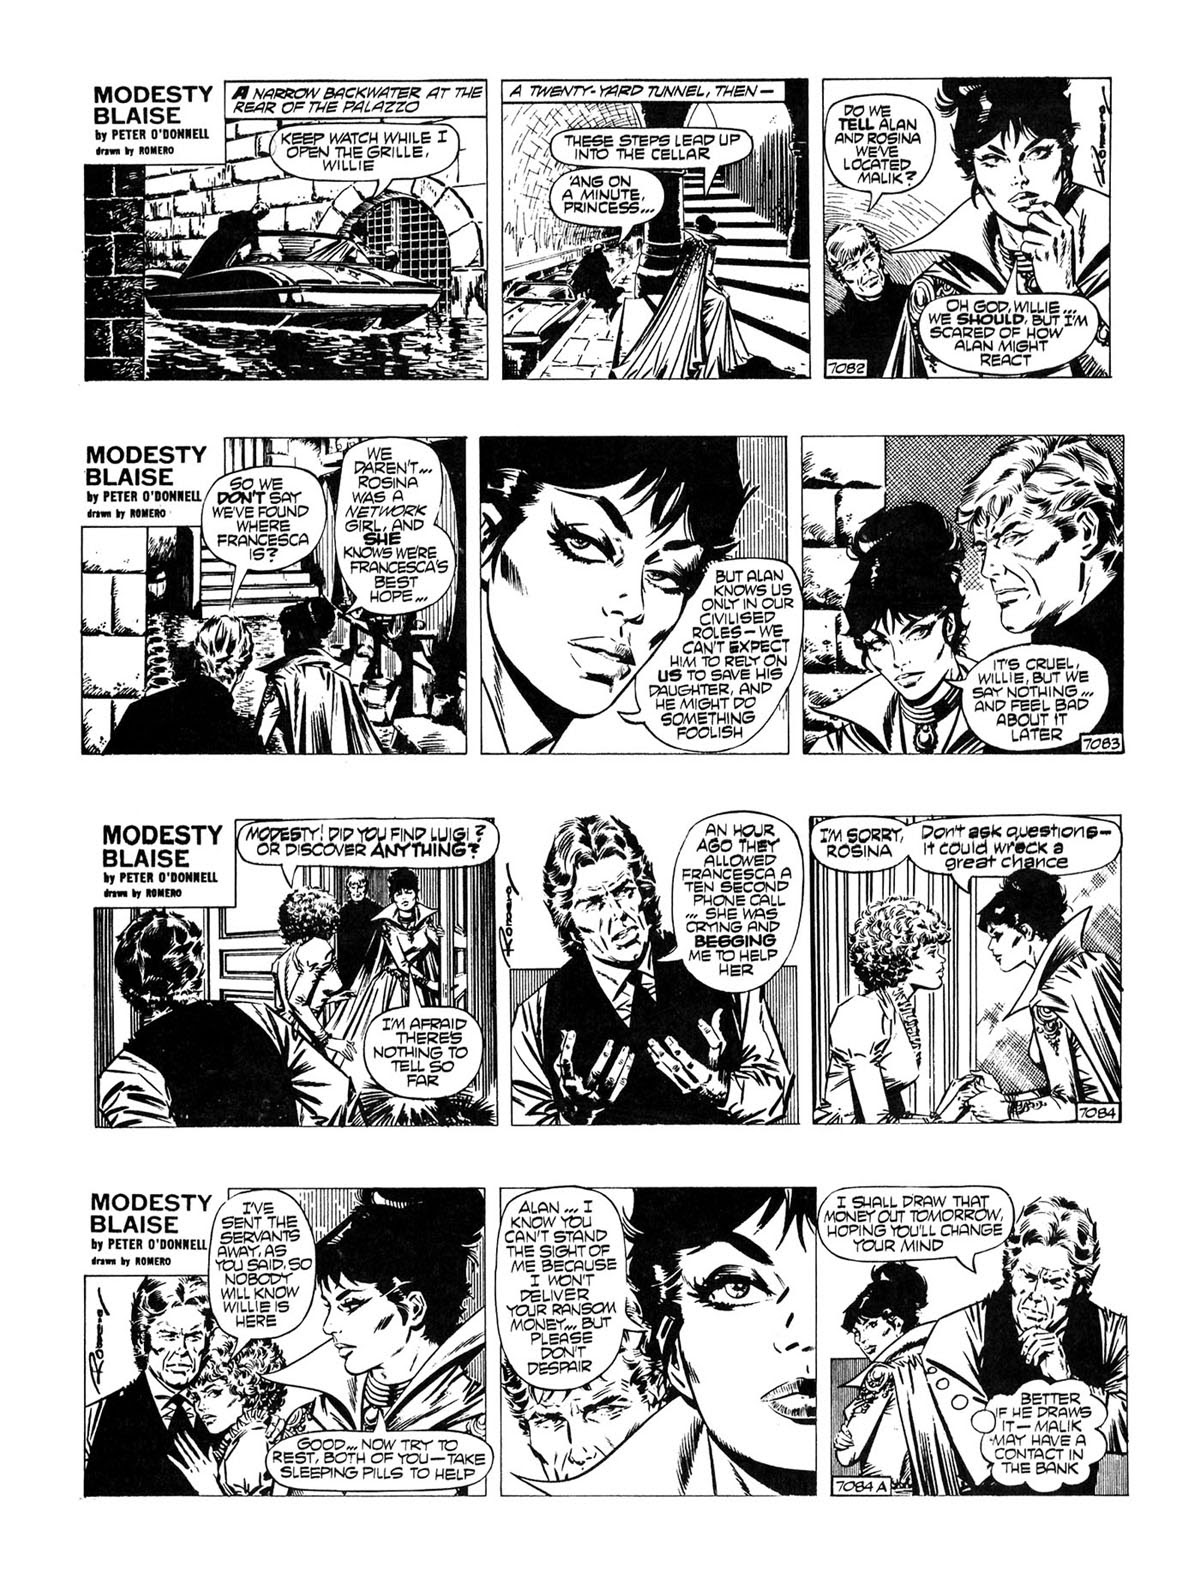 Read online Modesty Blaise Live bait comic -  Issue # TPB - 16